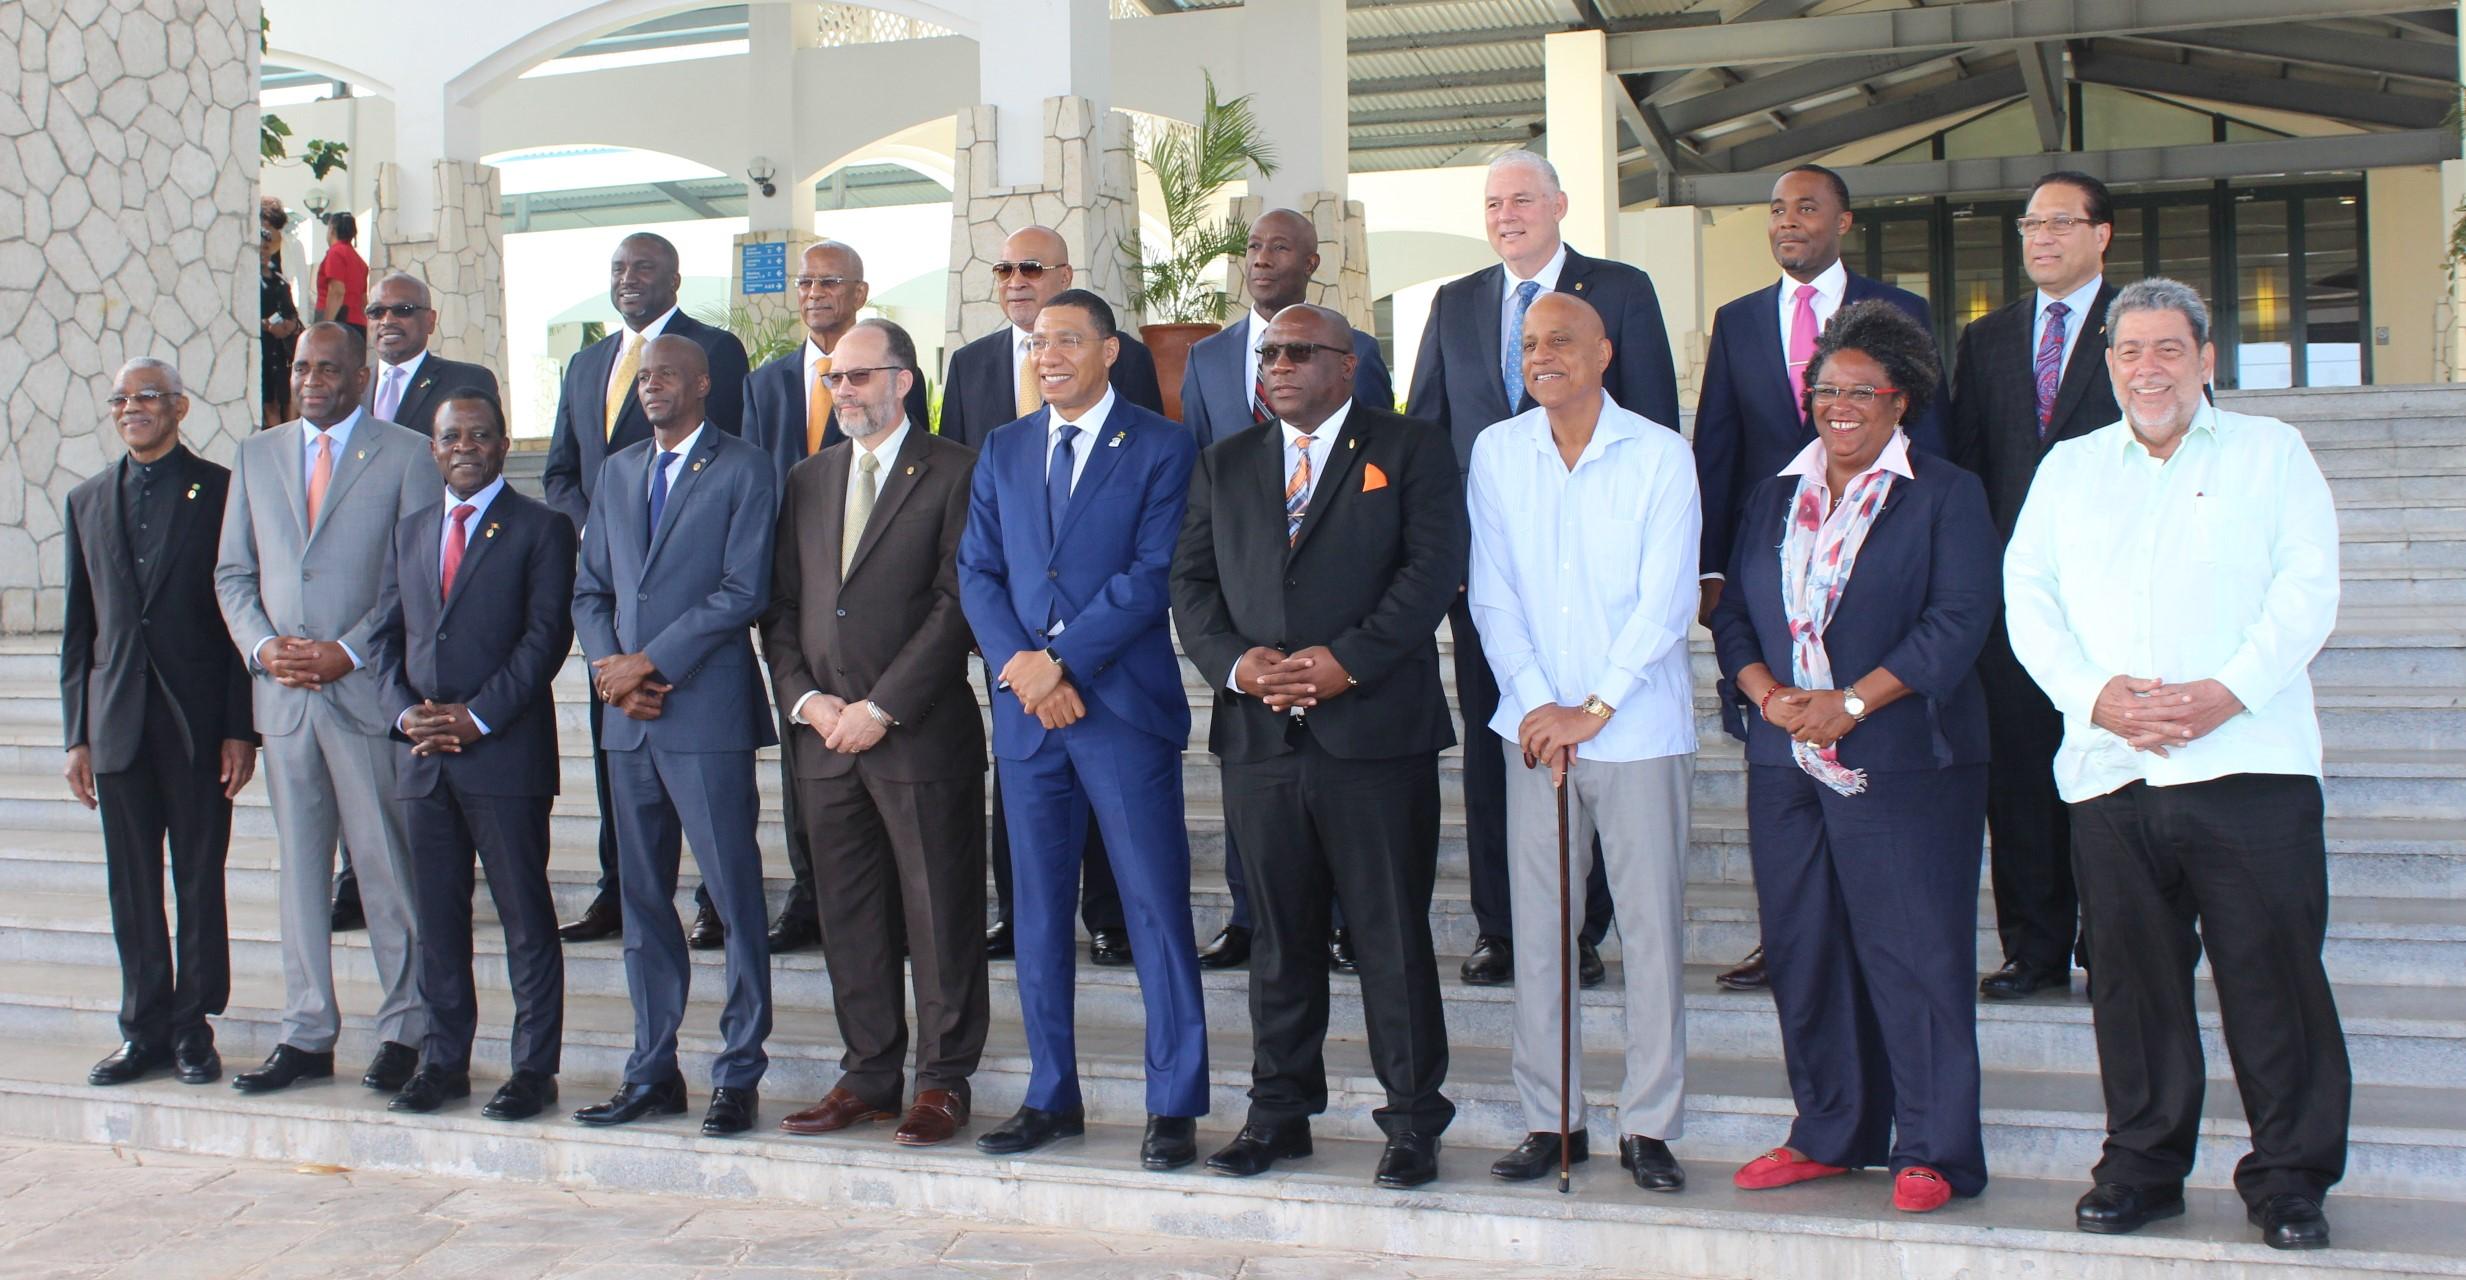 CARICOM Heads at the 39th Regular Meeting, Montego Bay, Jamaica